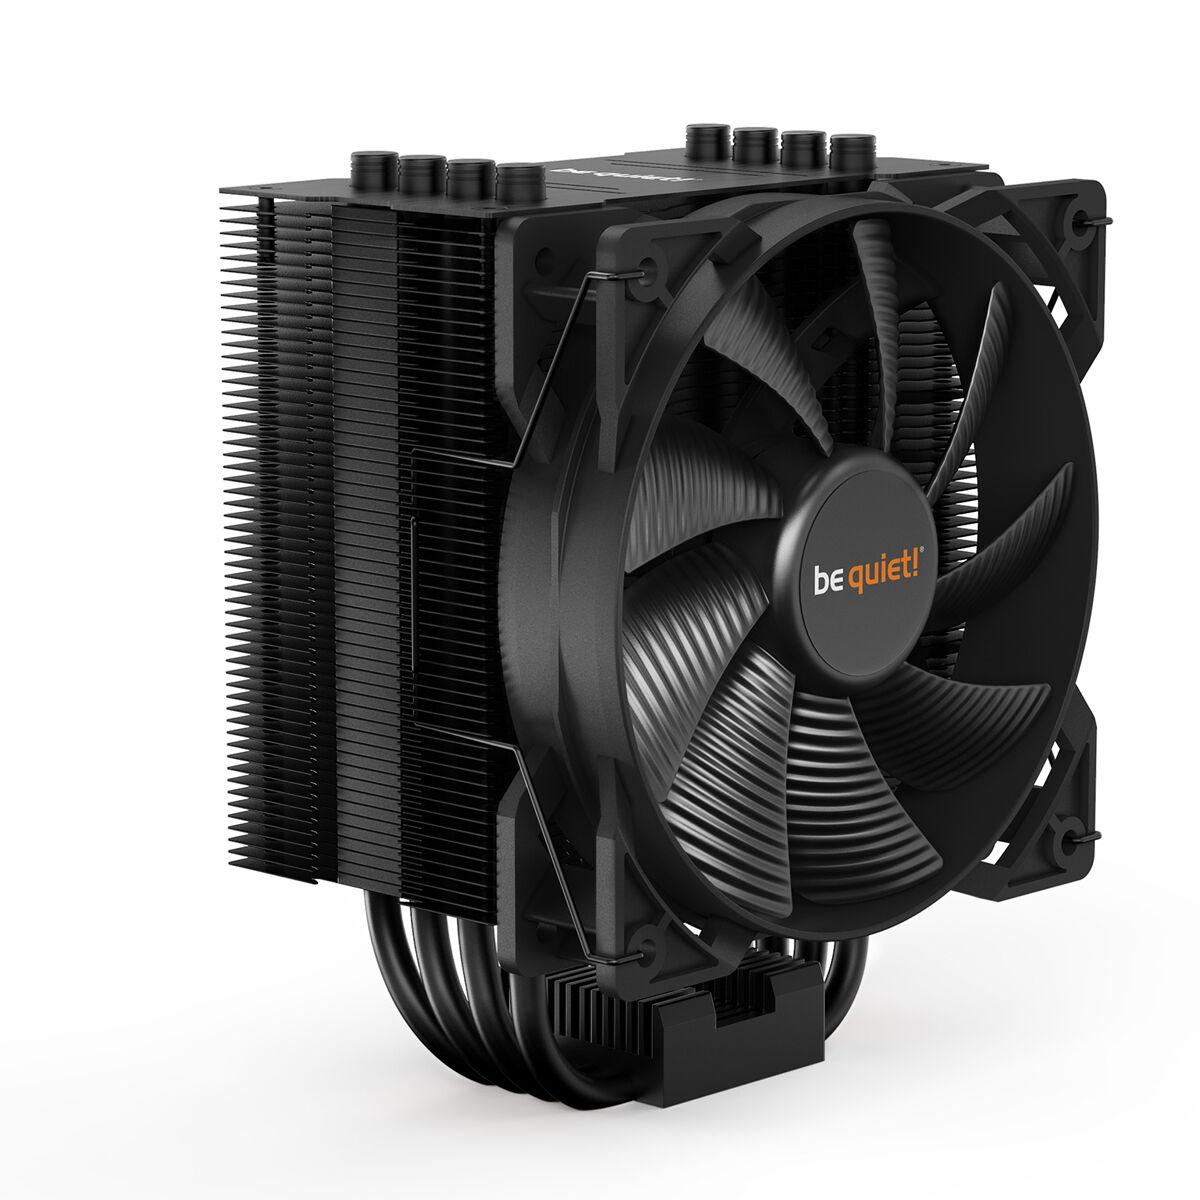 be quiet! Pure Rock 2 Black, CPU-Kühler mit top Preisleistungsverhältnis